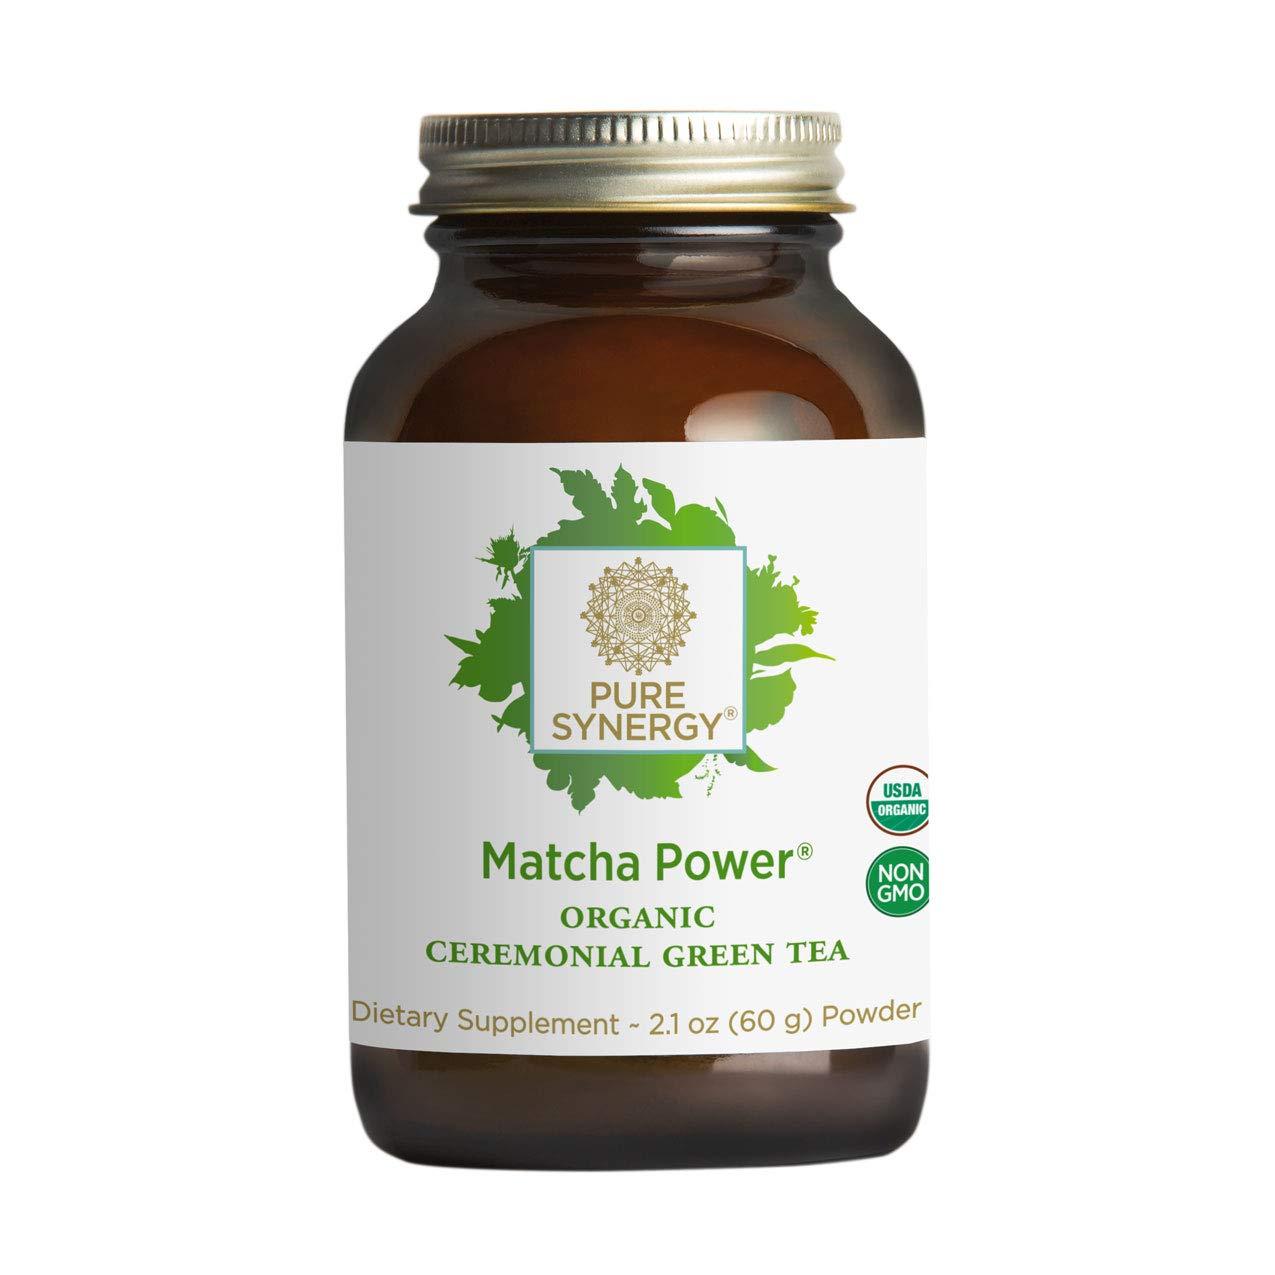 Pure Synergy USDA Organic Matcha Power (2.1 oz Powder) Ceremonial Japanese Green Tea Powder by Pure Synergy